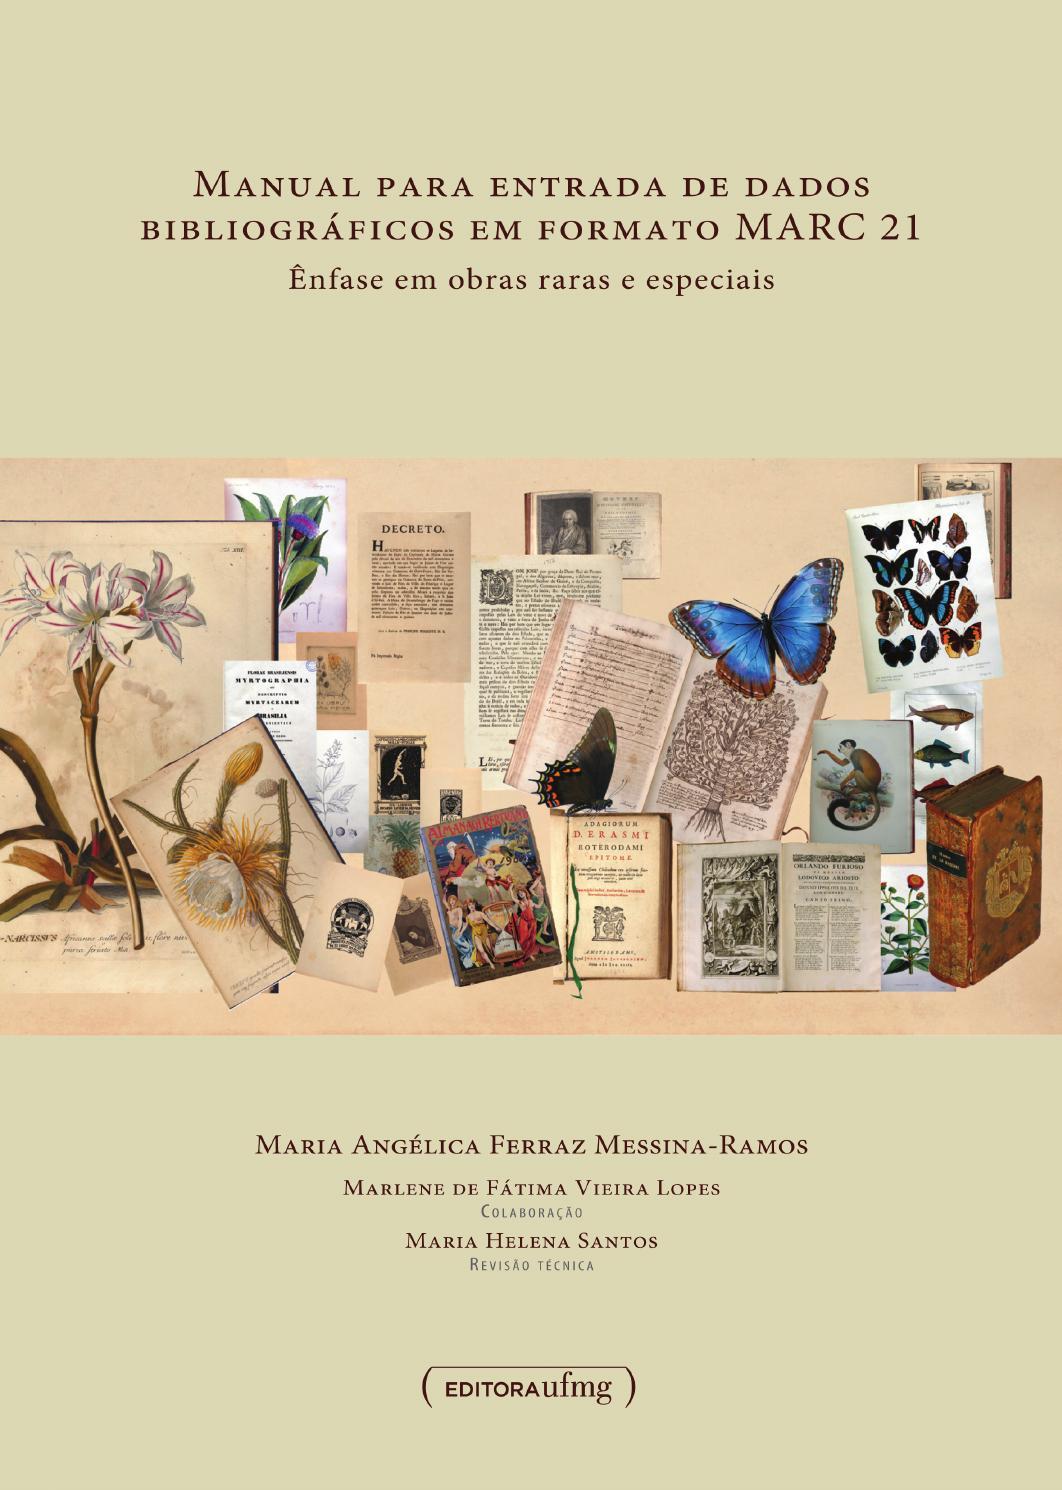 Manual obras raras completo versao publicada by jlia marreto issuu fandeluxe Images